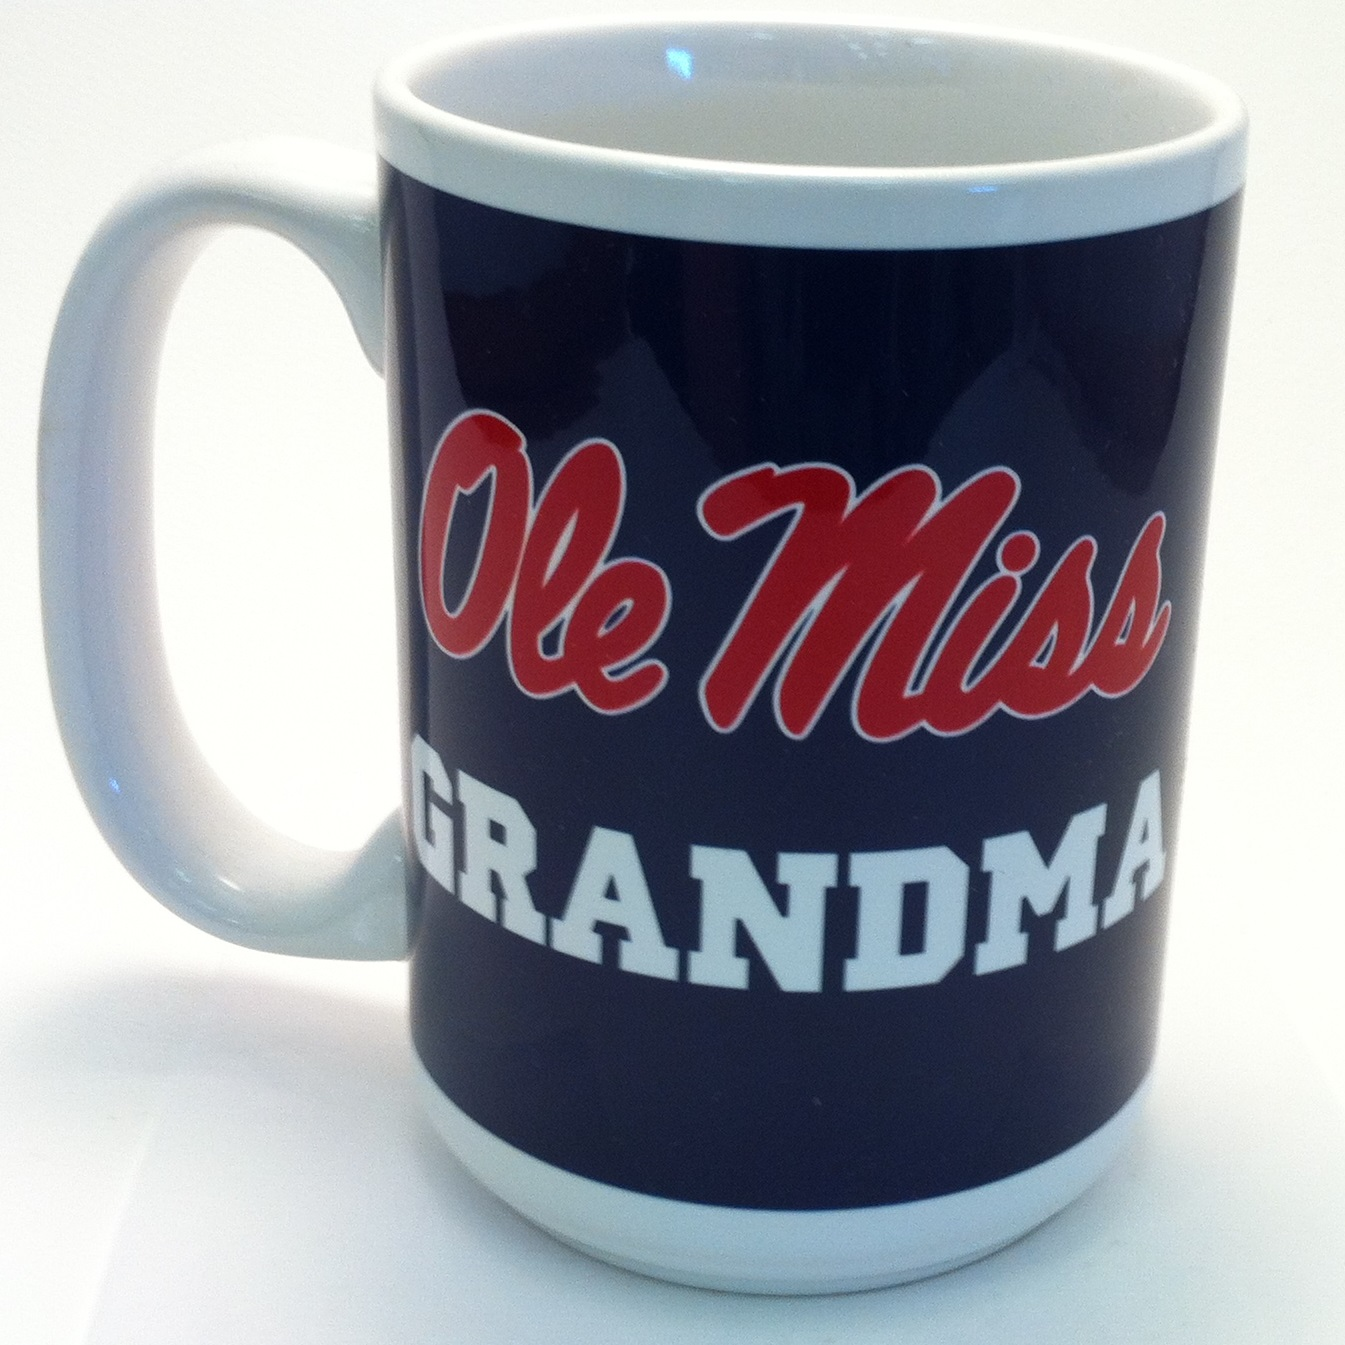 Namedrop Mug - Grandma